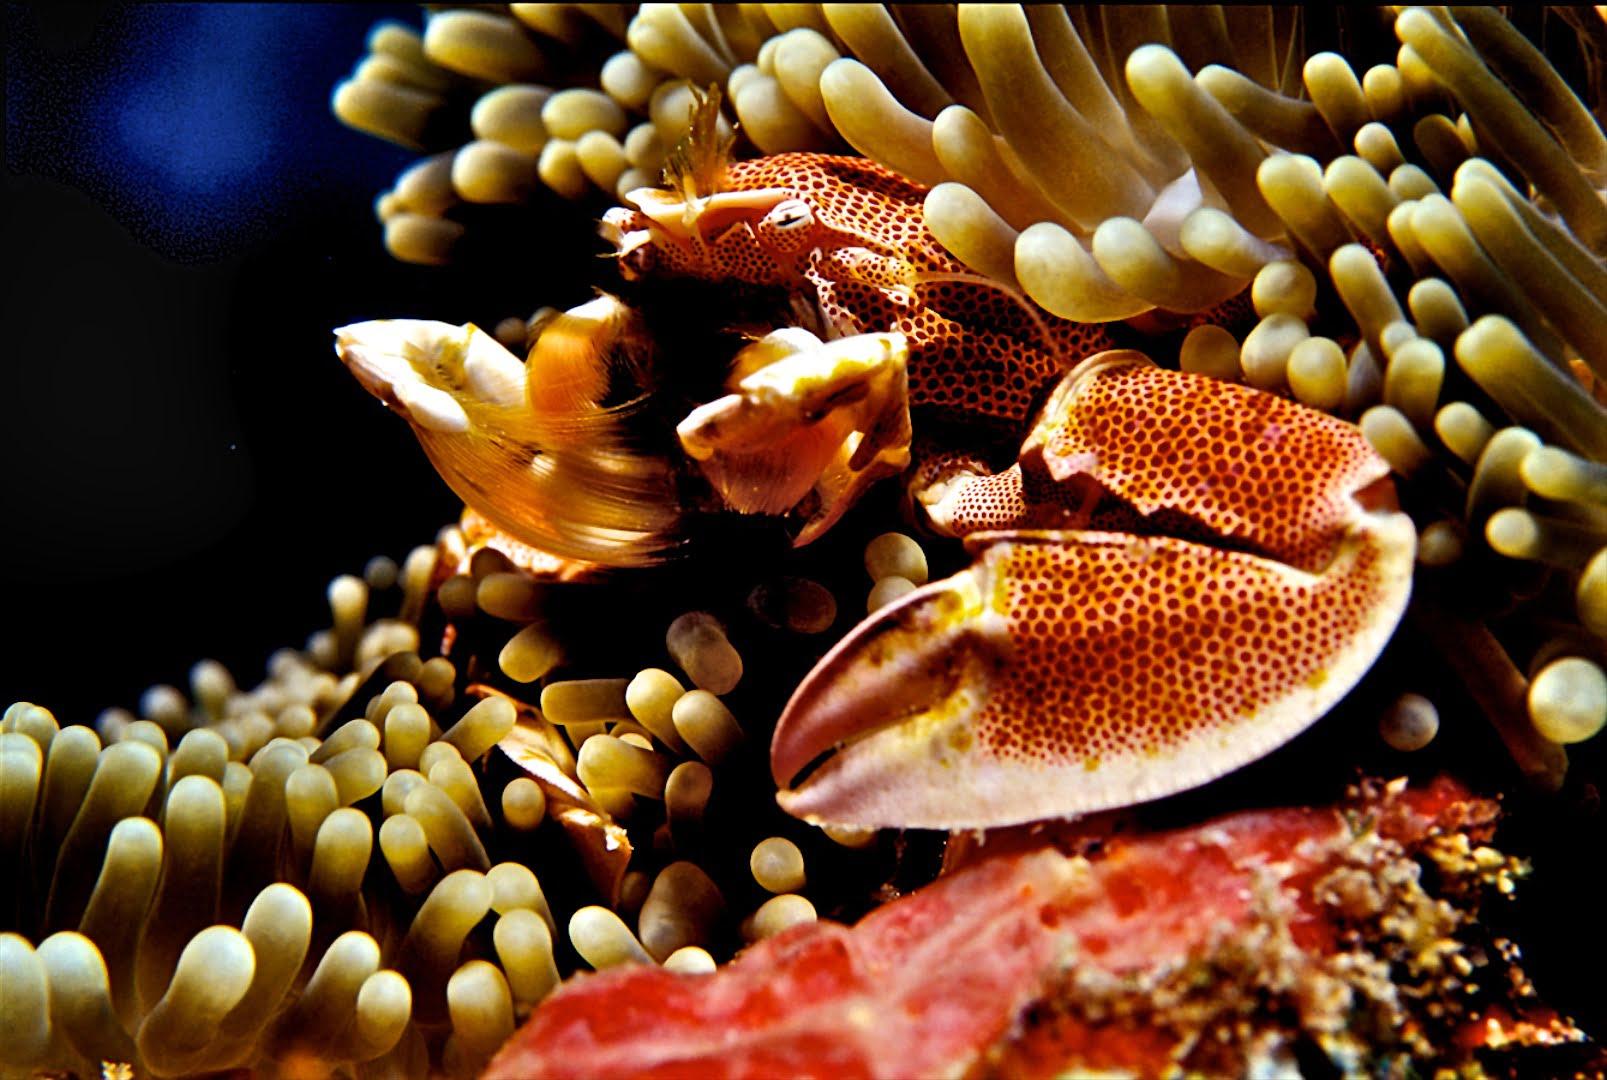 Seafari plongée aux Philippines